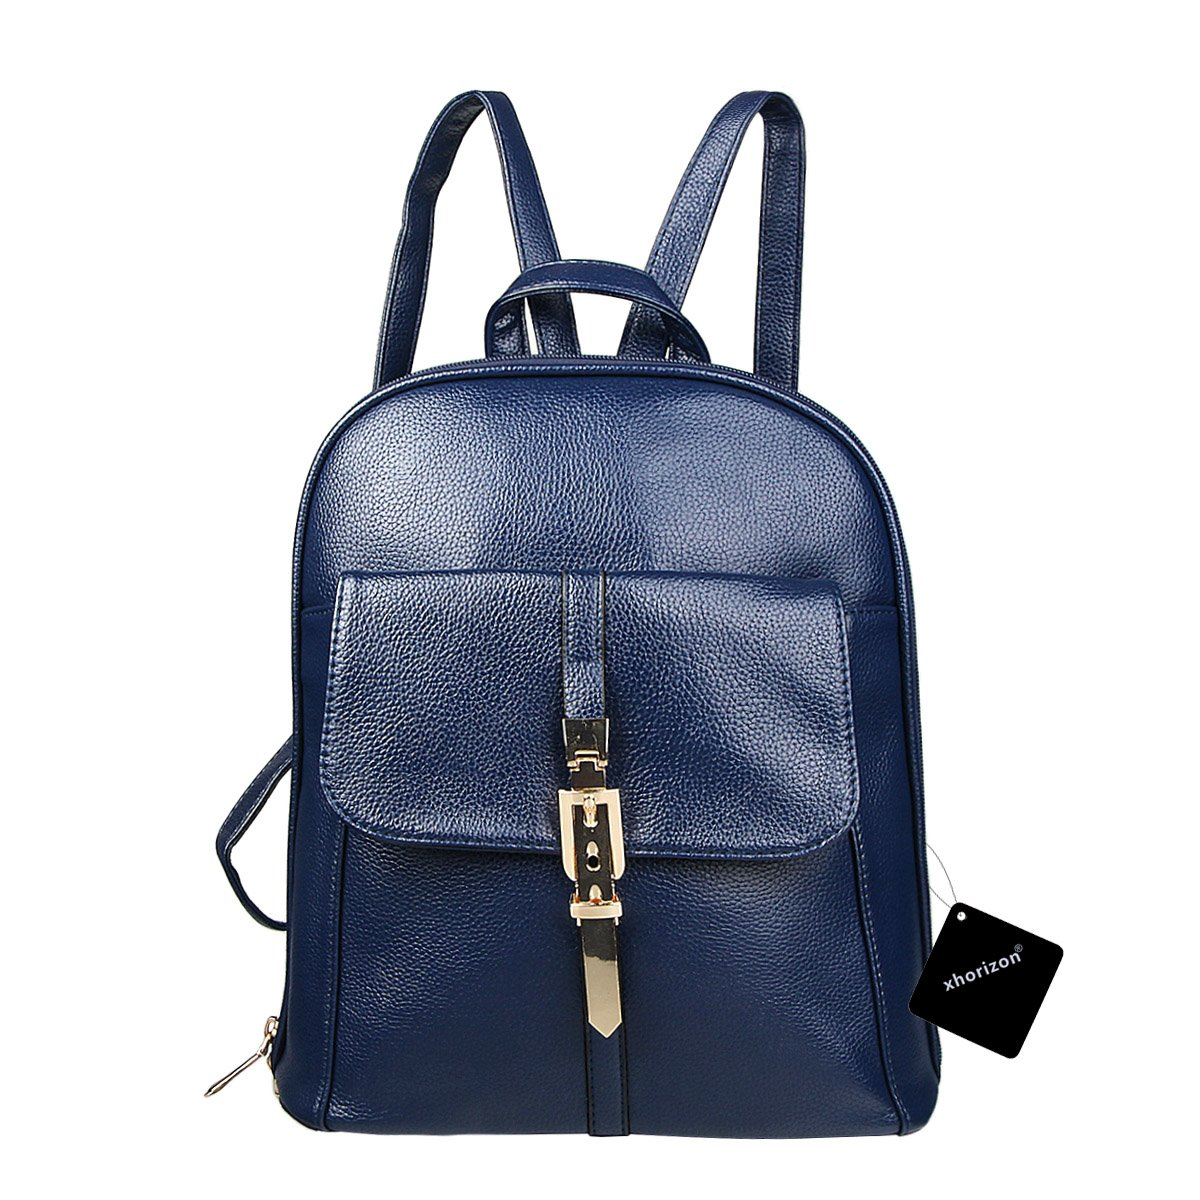 xhorizon TM FL1 Leather Mini School Bag Travel Backpack Rucksack Shoulder Bag Satchel (Navy) by xhorizon (Image #1)